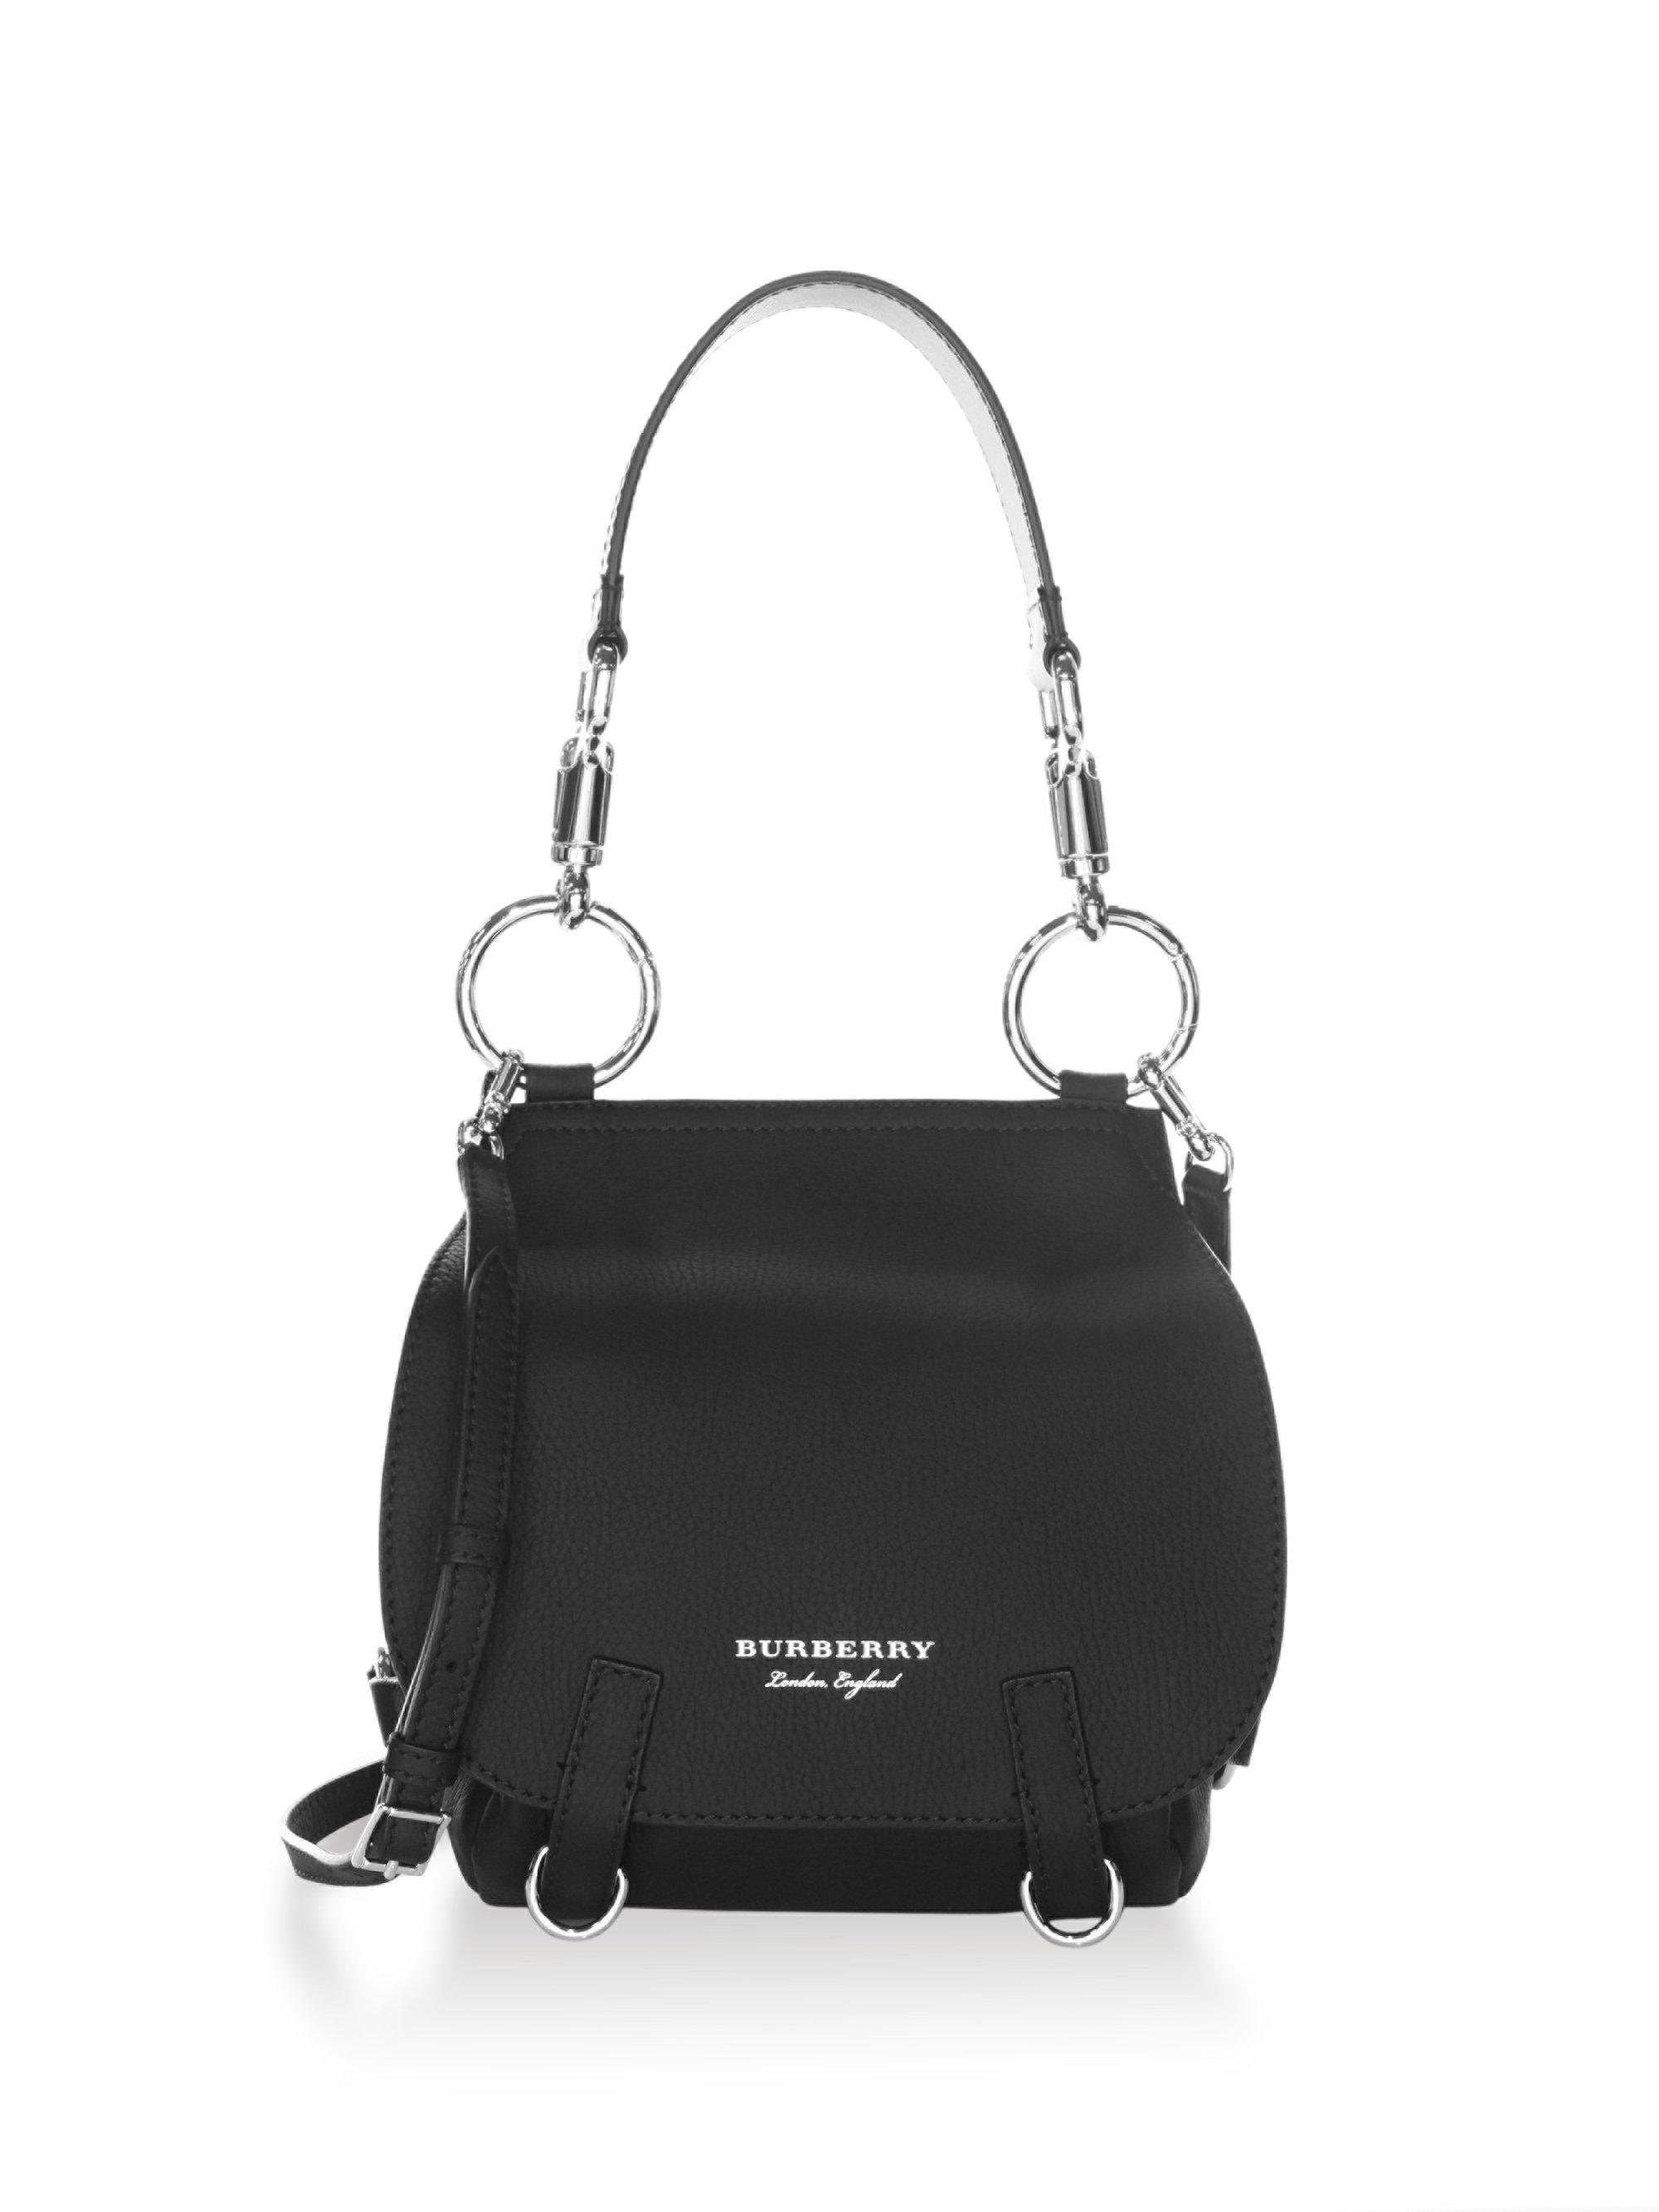 Lyst - Burberry Bridle Leather Crossbody Bag in Black 377def6dafec2